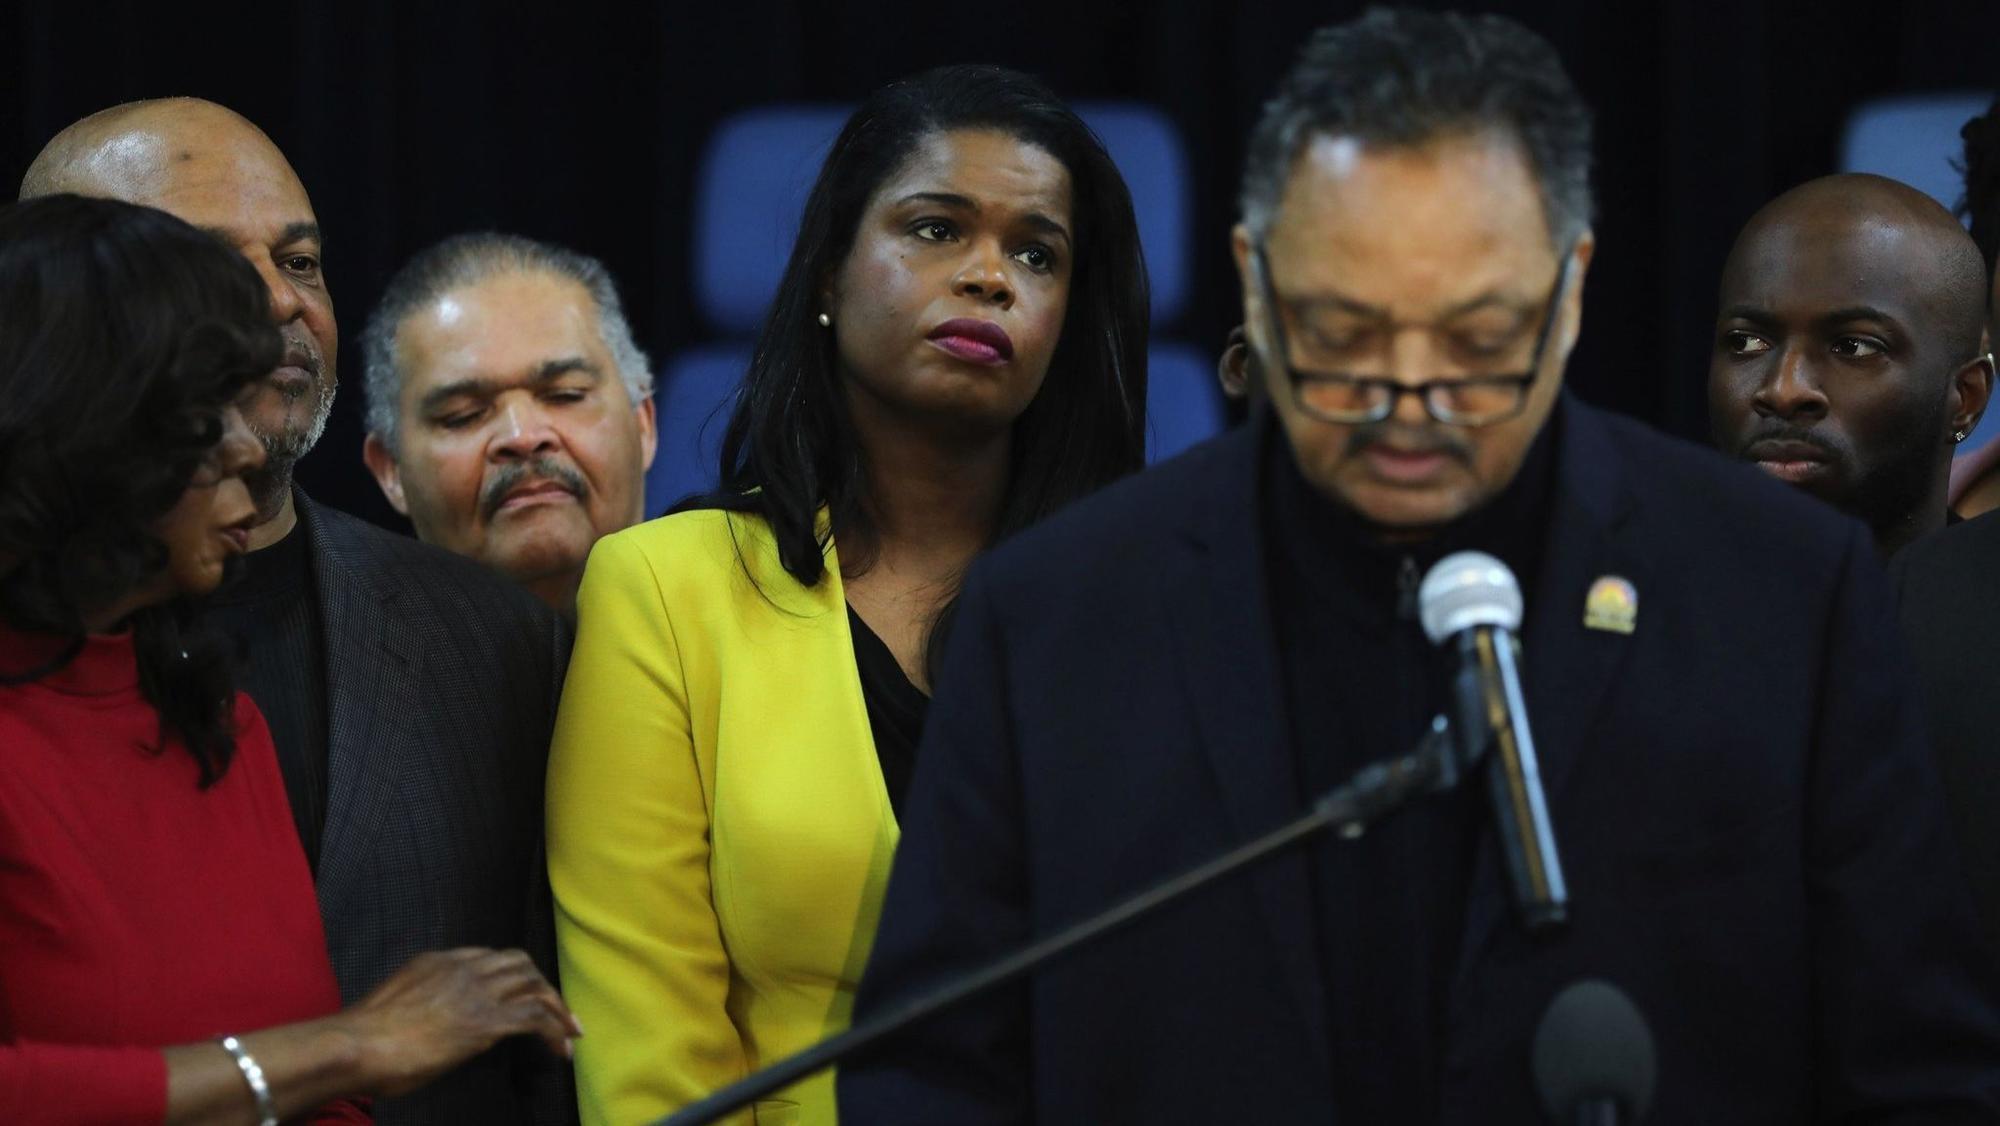 city prosecutor joins race - HD2000×1126